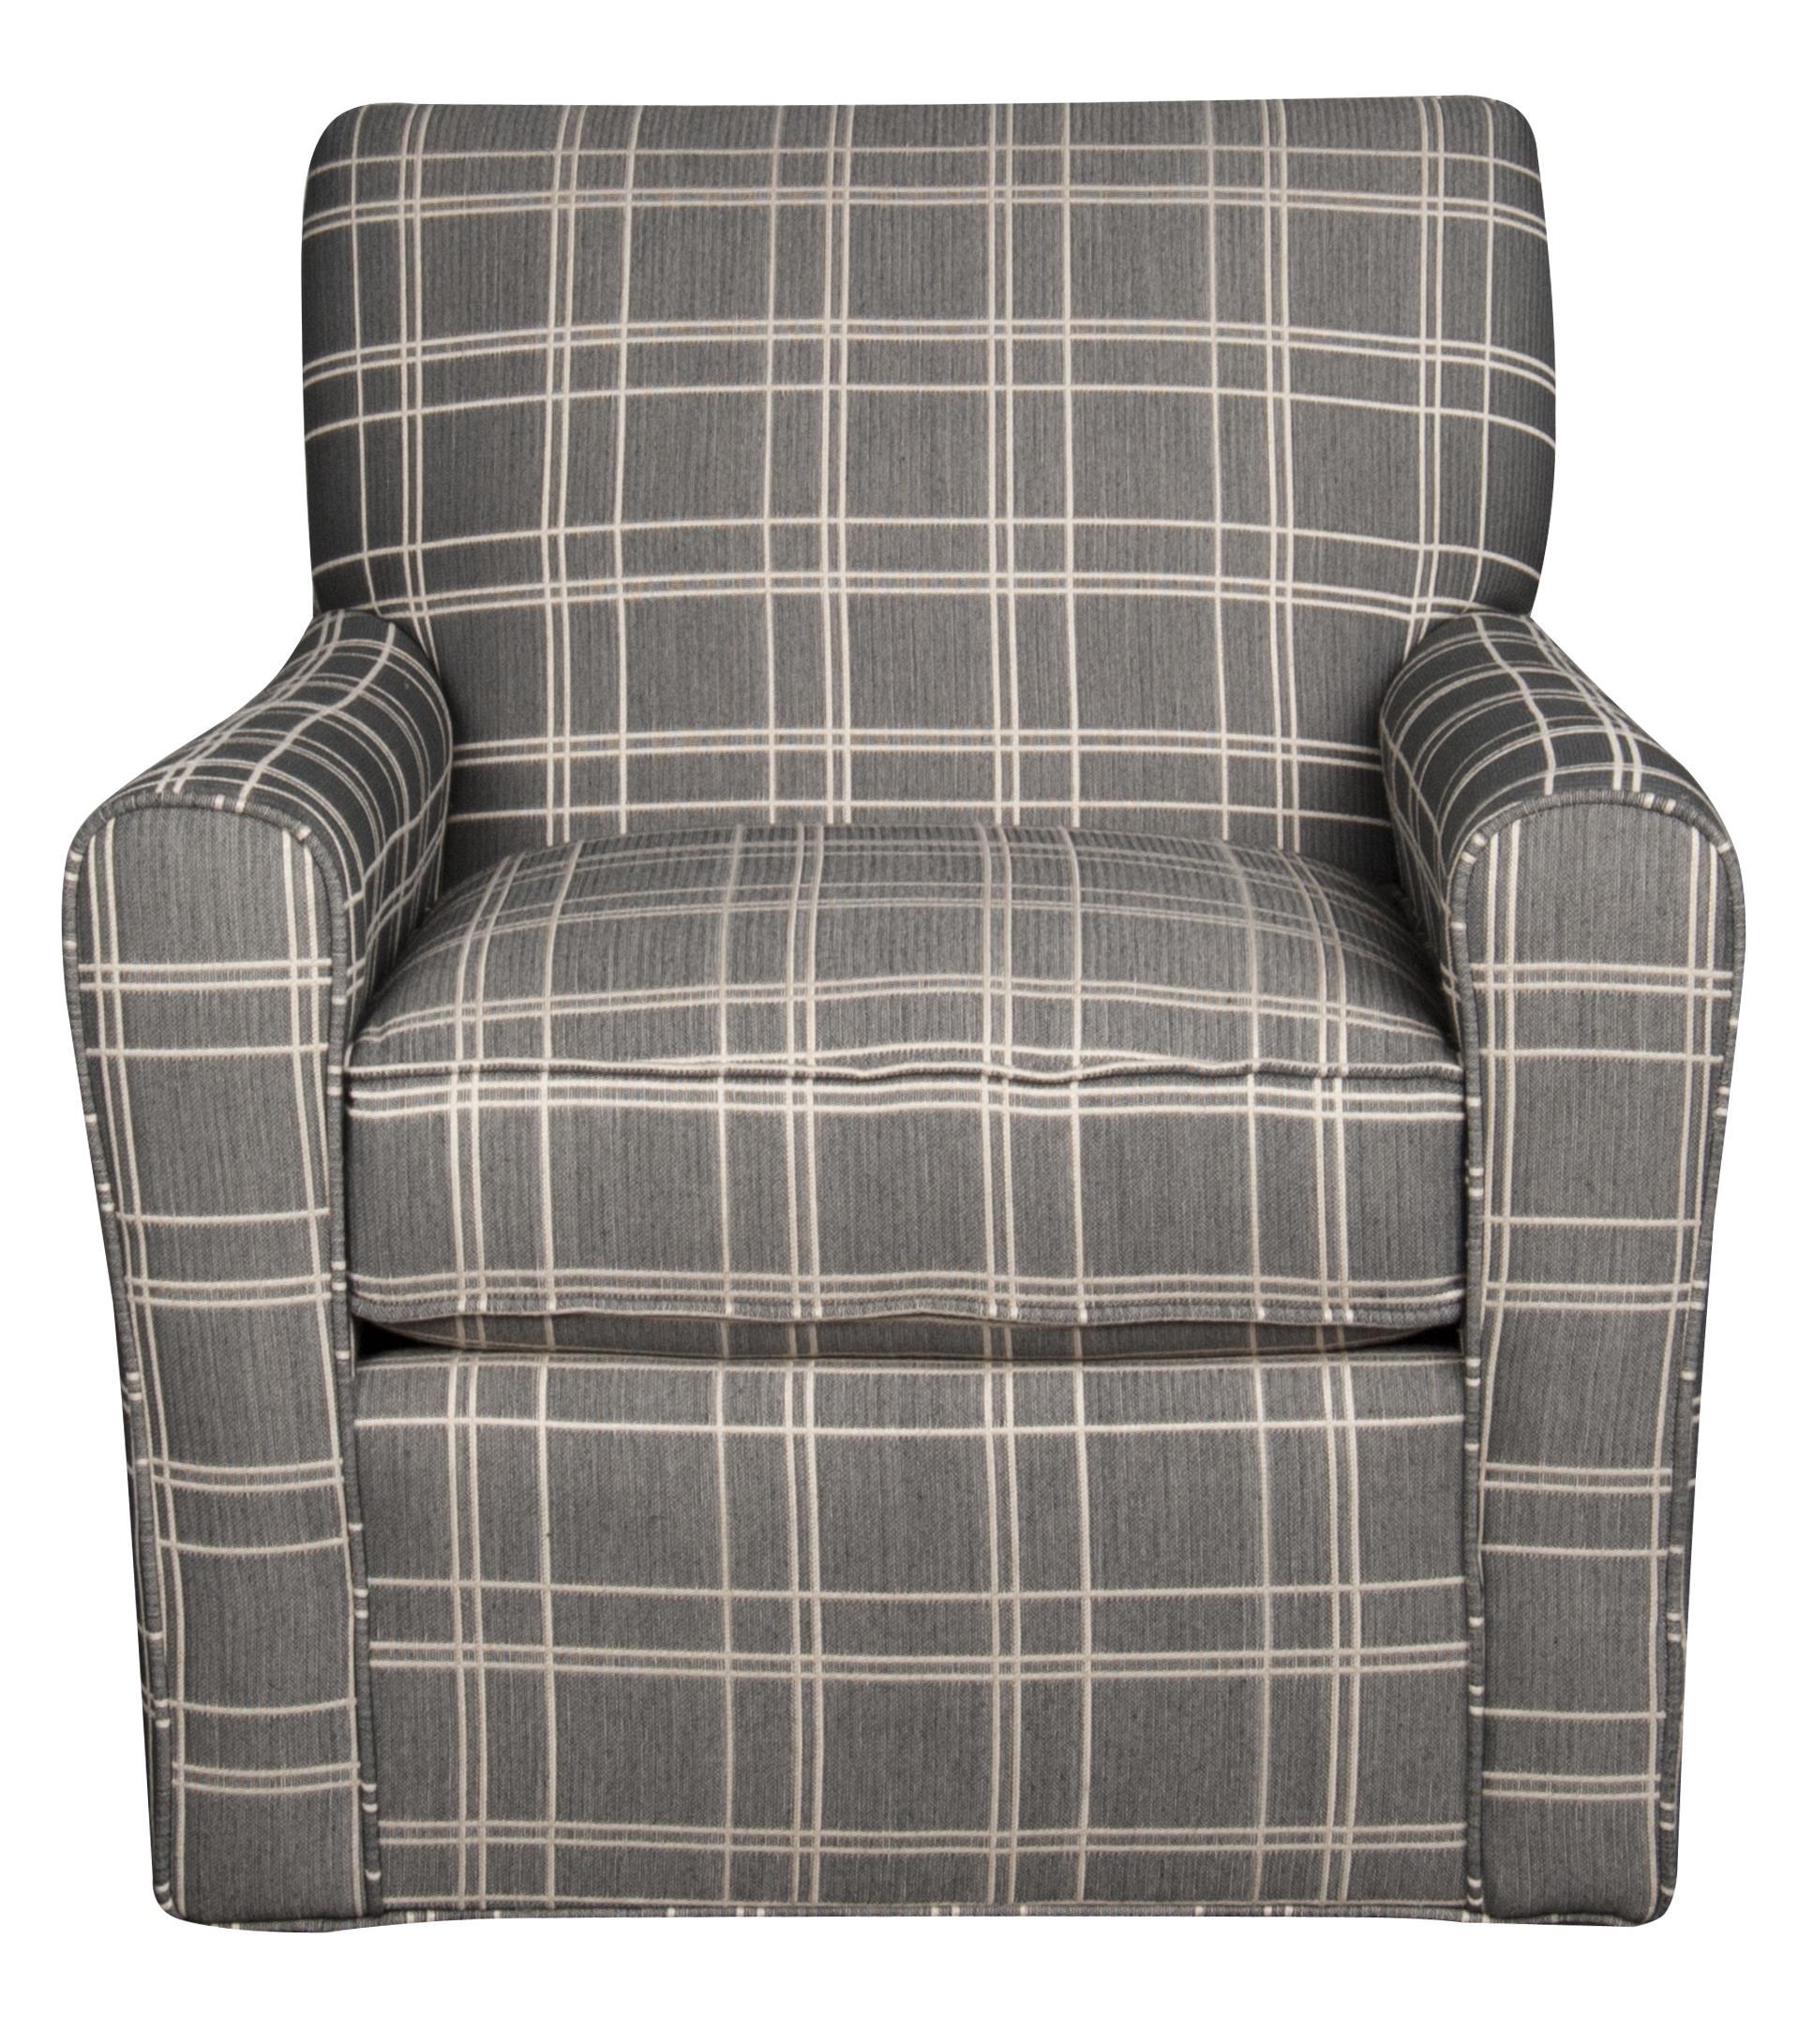 swivel chair not staying up pedicure chairs uk main madison sarah morris home glider rockers sarahsarah